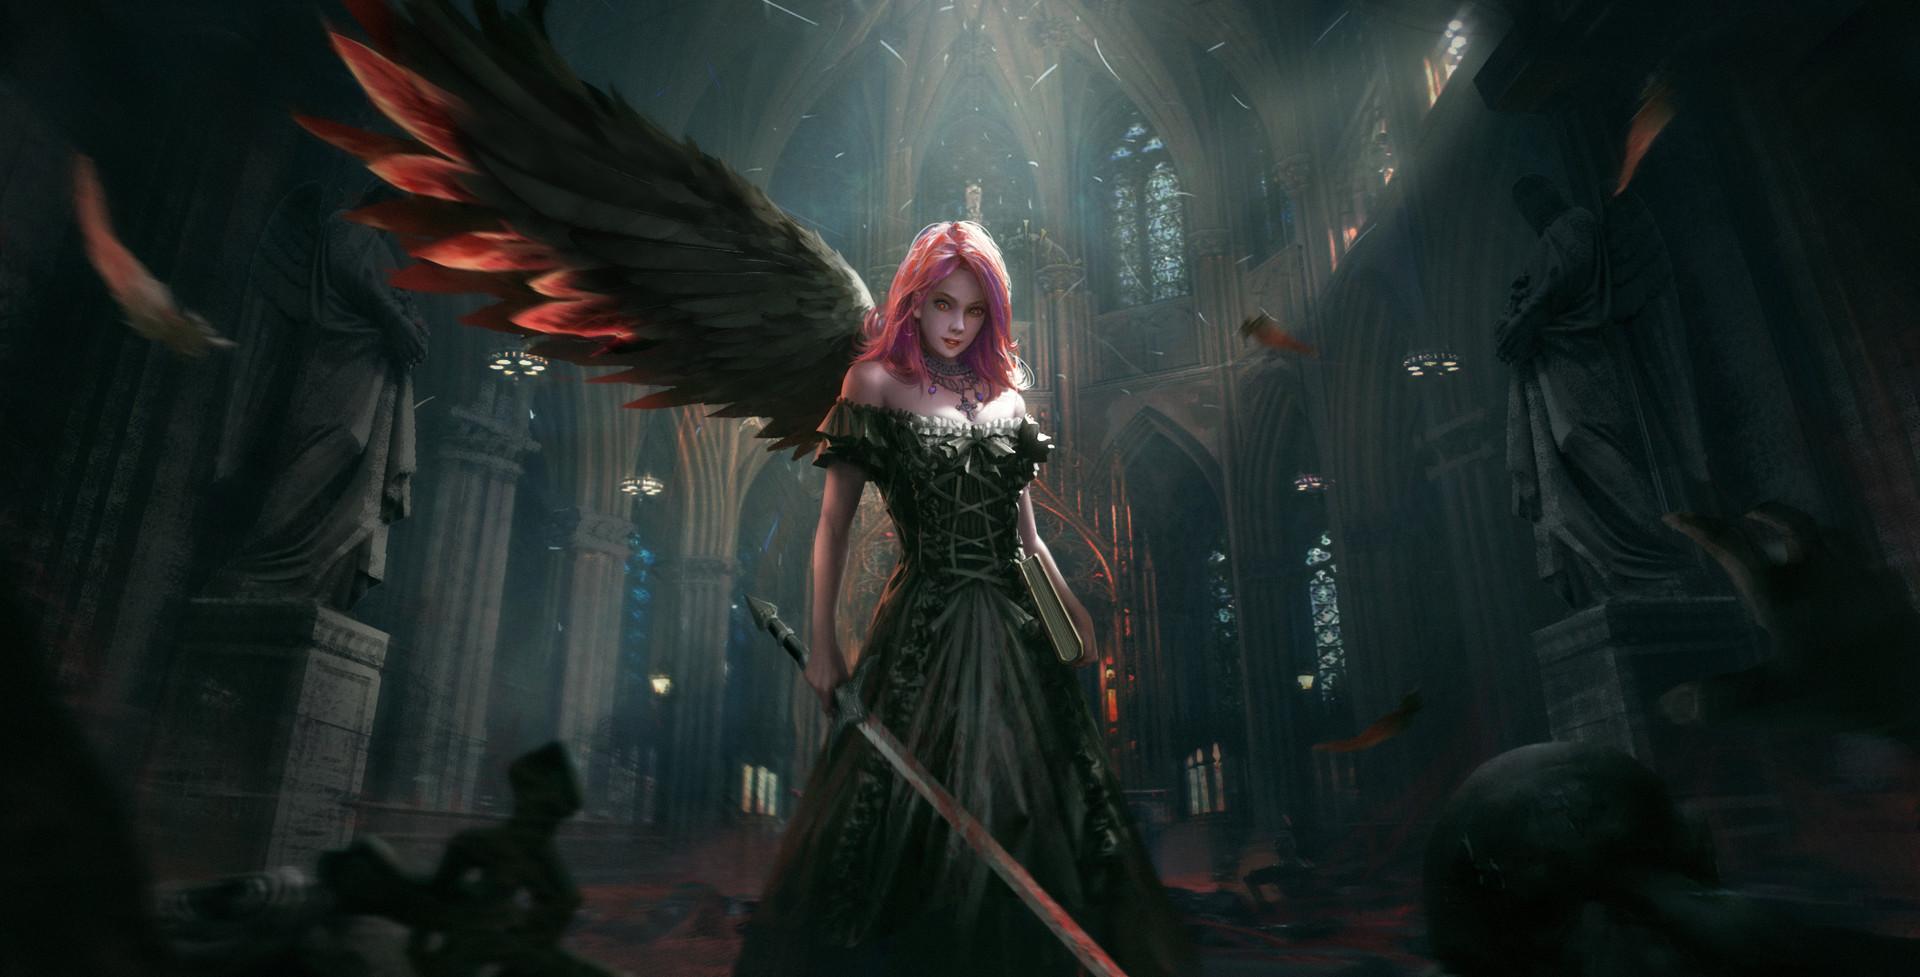 Artwork Fantasy Art Angel Wallpapers Hd Desktop And: Dark Angel, HD Fantasy Girls, 4k Wallpapers, Images